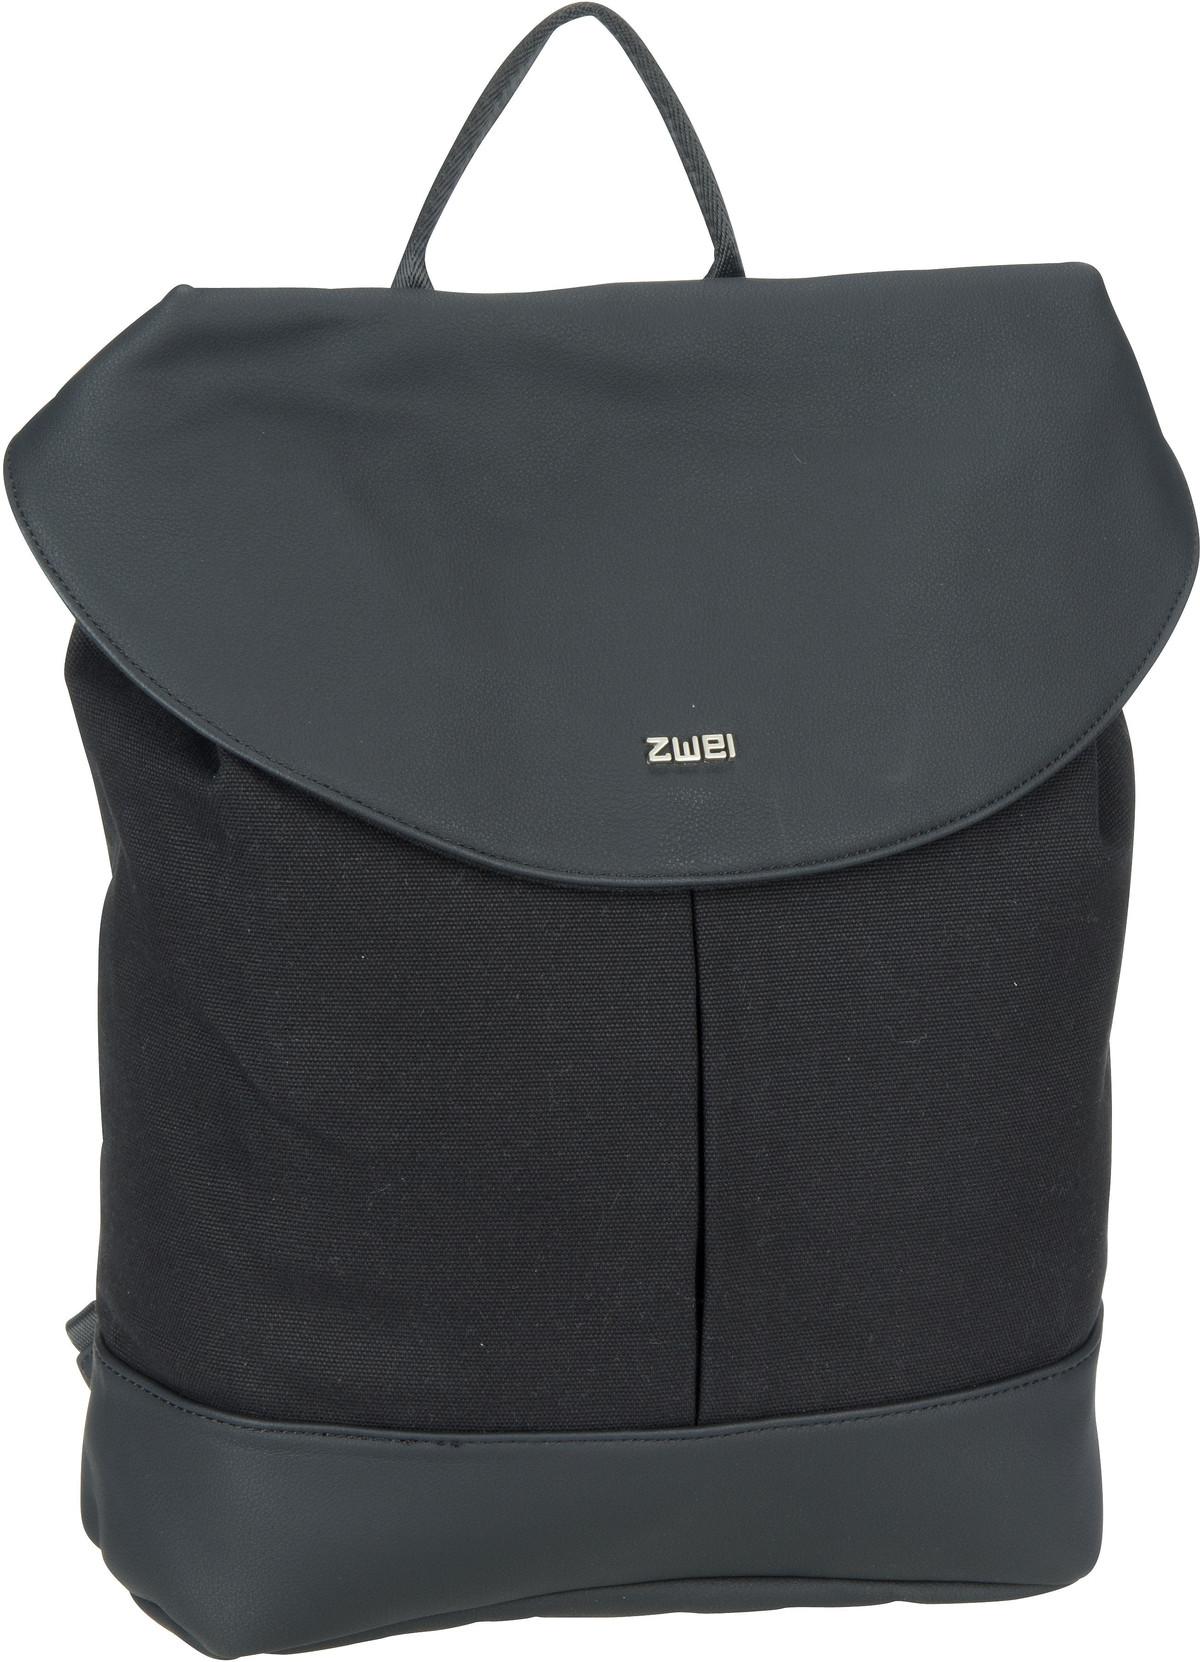 Rucksack / Daypack Paula PAR120 Black (11 Liter)